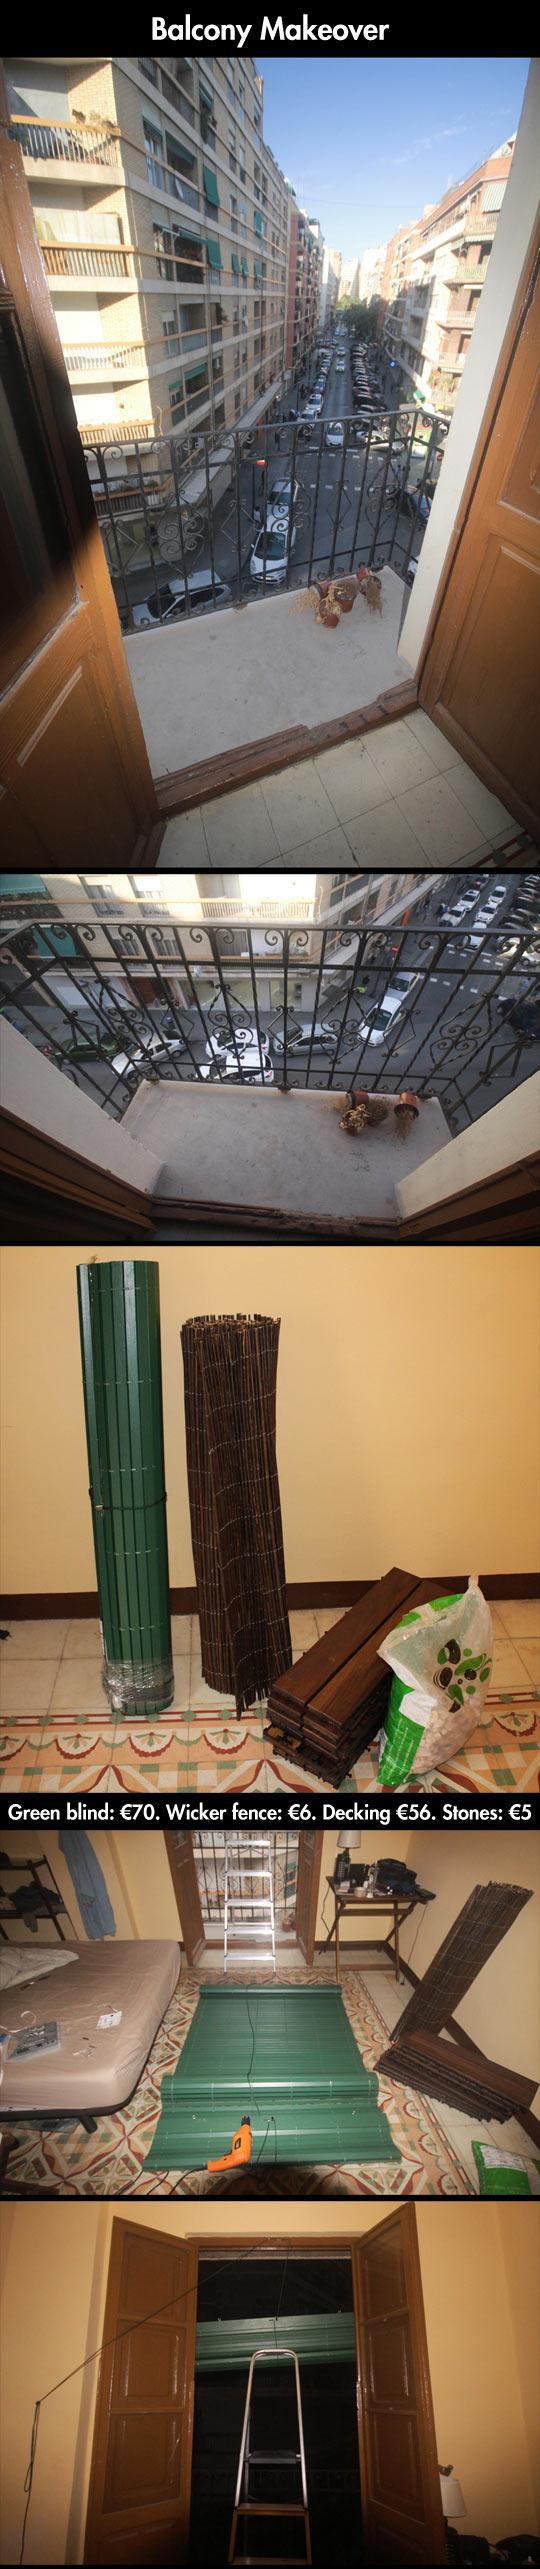 Very Creative Way To Renew Your Balcony